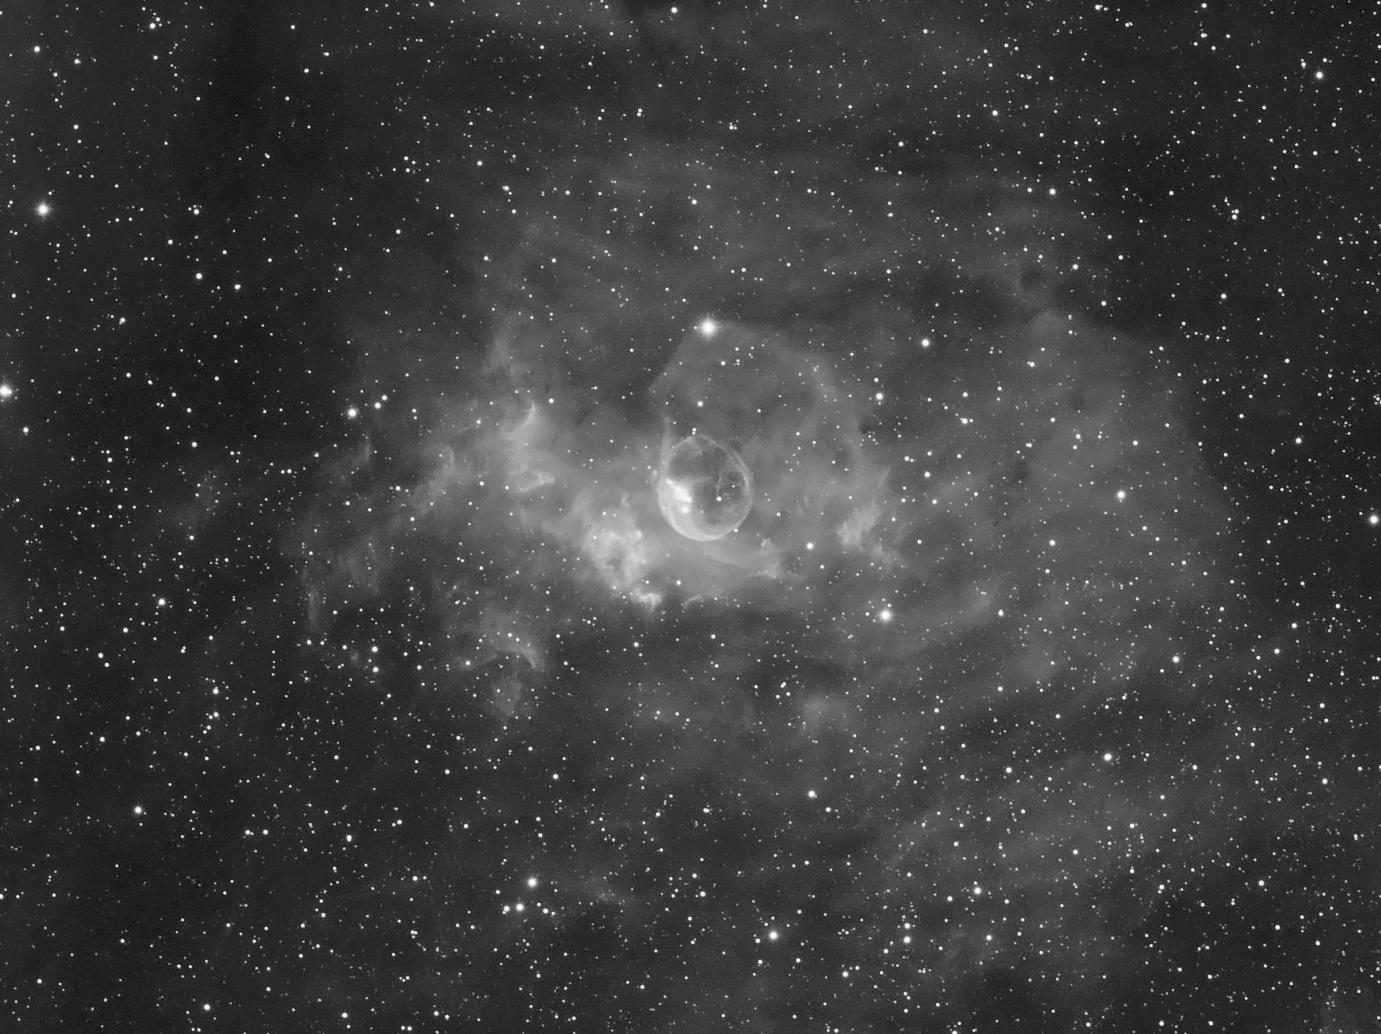 NGC 7635-Ha3-iris-1-cs5-3-FINAL.png